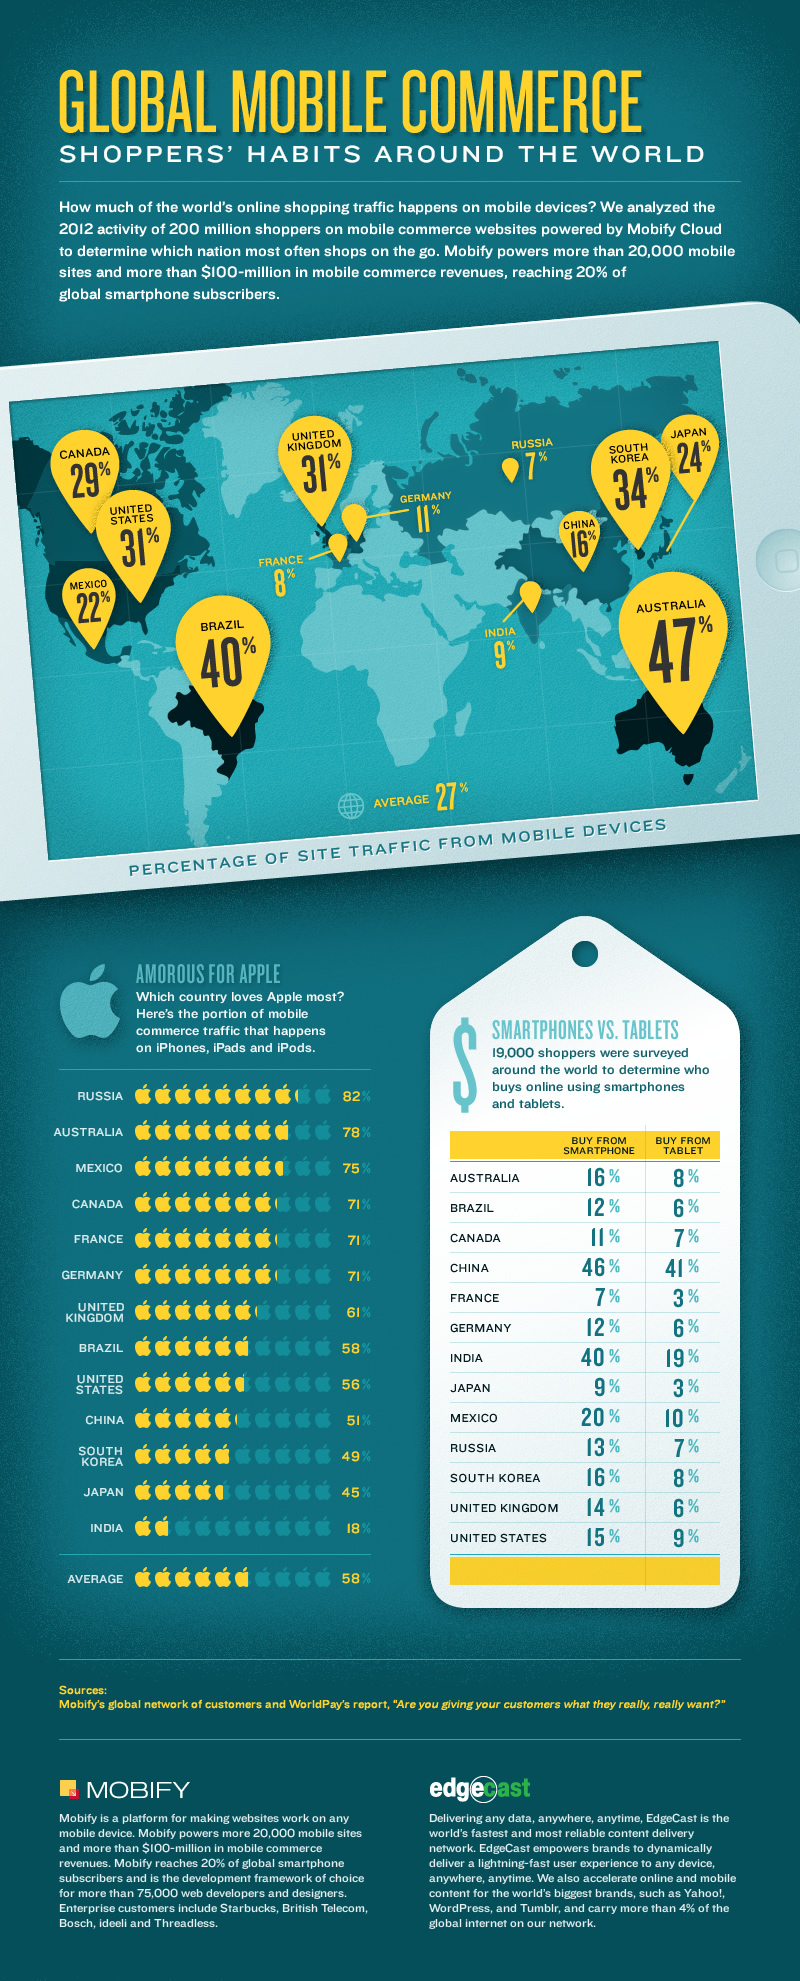 Mobify mobile commerce world ranking